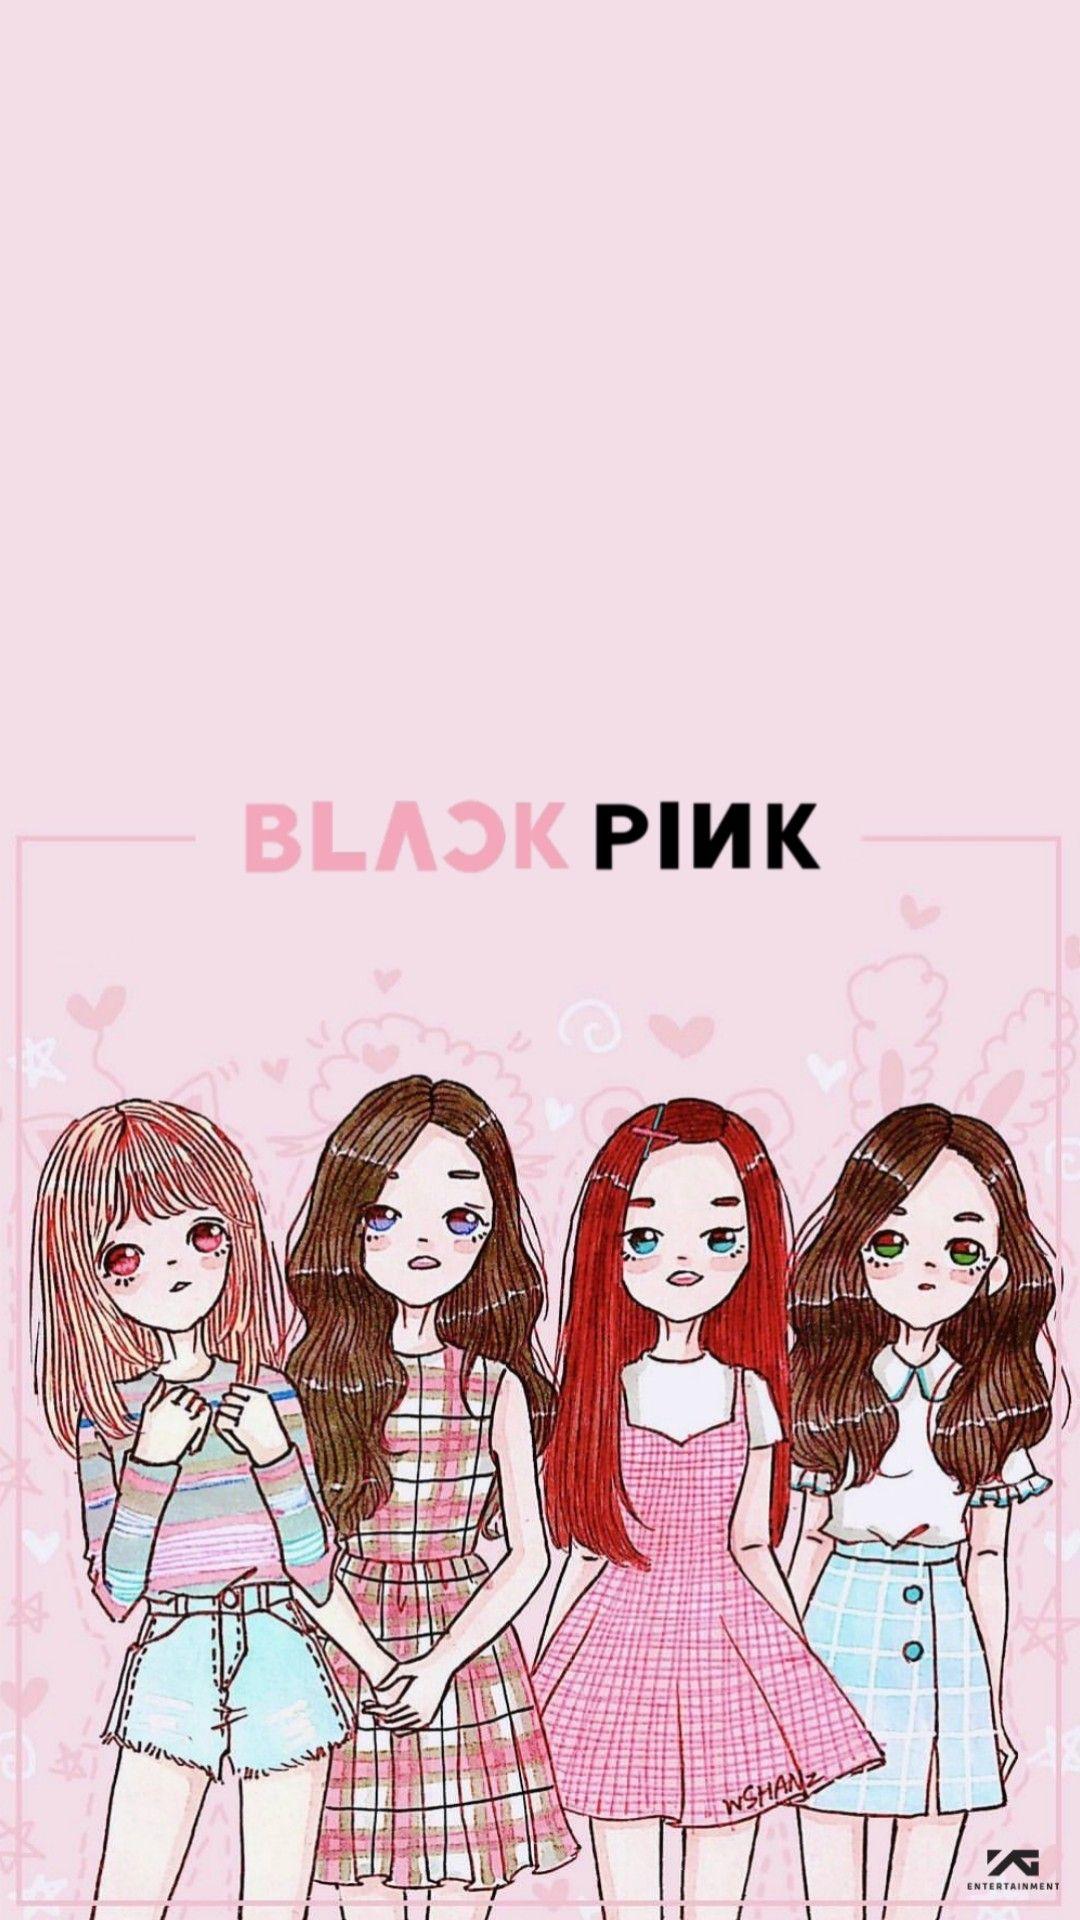 Blackpink Wallpaper Blackpink Wallpaper Hd Cute Colorful Lisa Rose Jisoo Jennie Fanart Chibi Serigrafi Sevimli Karikatur Doodle Desenleri